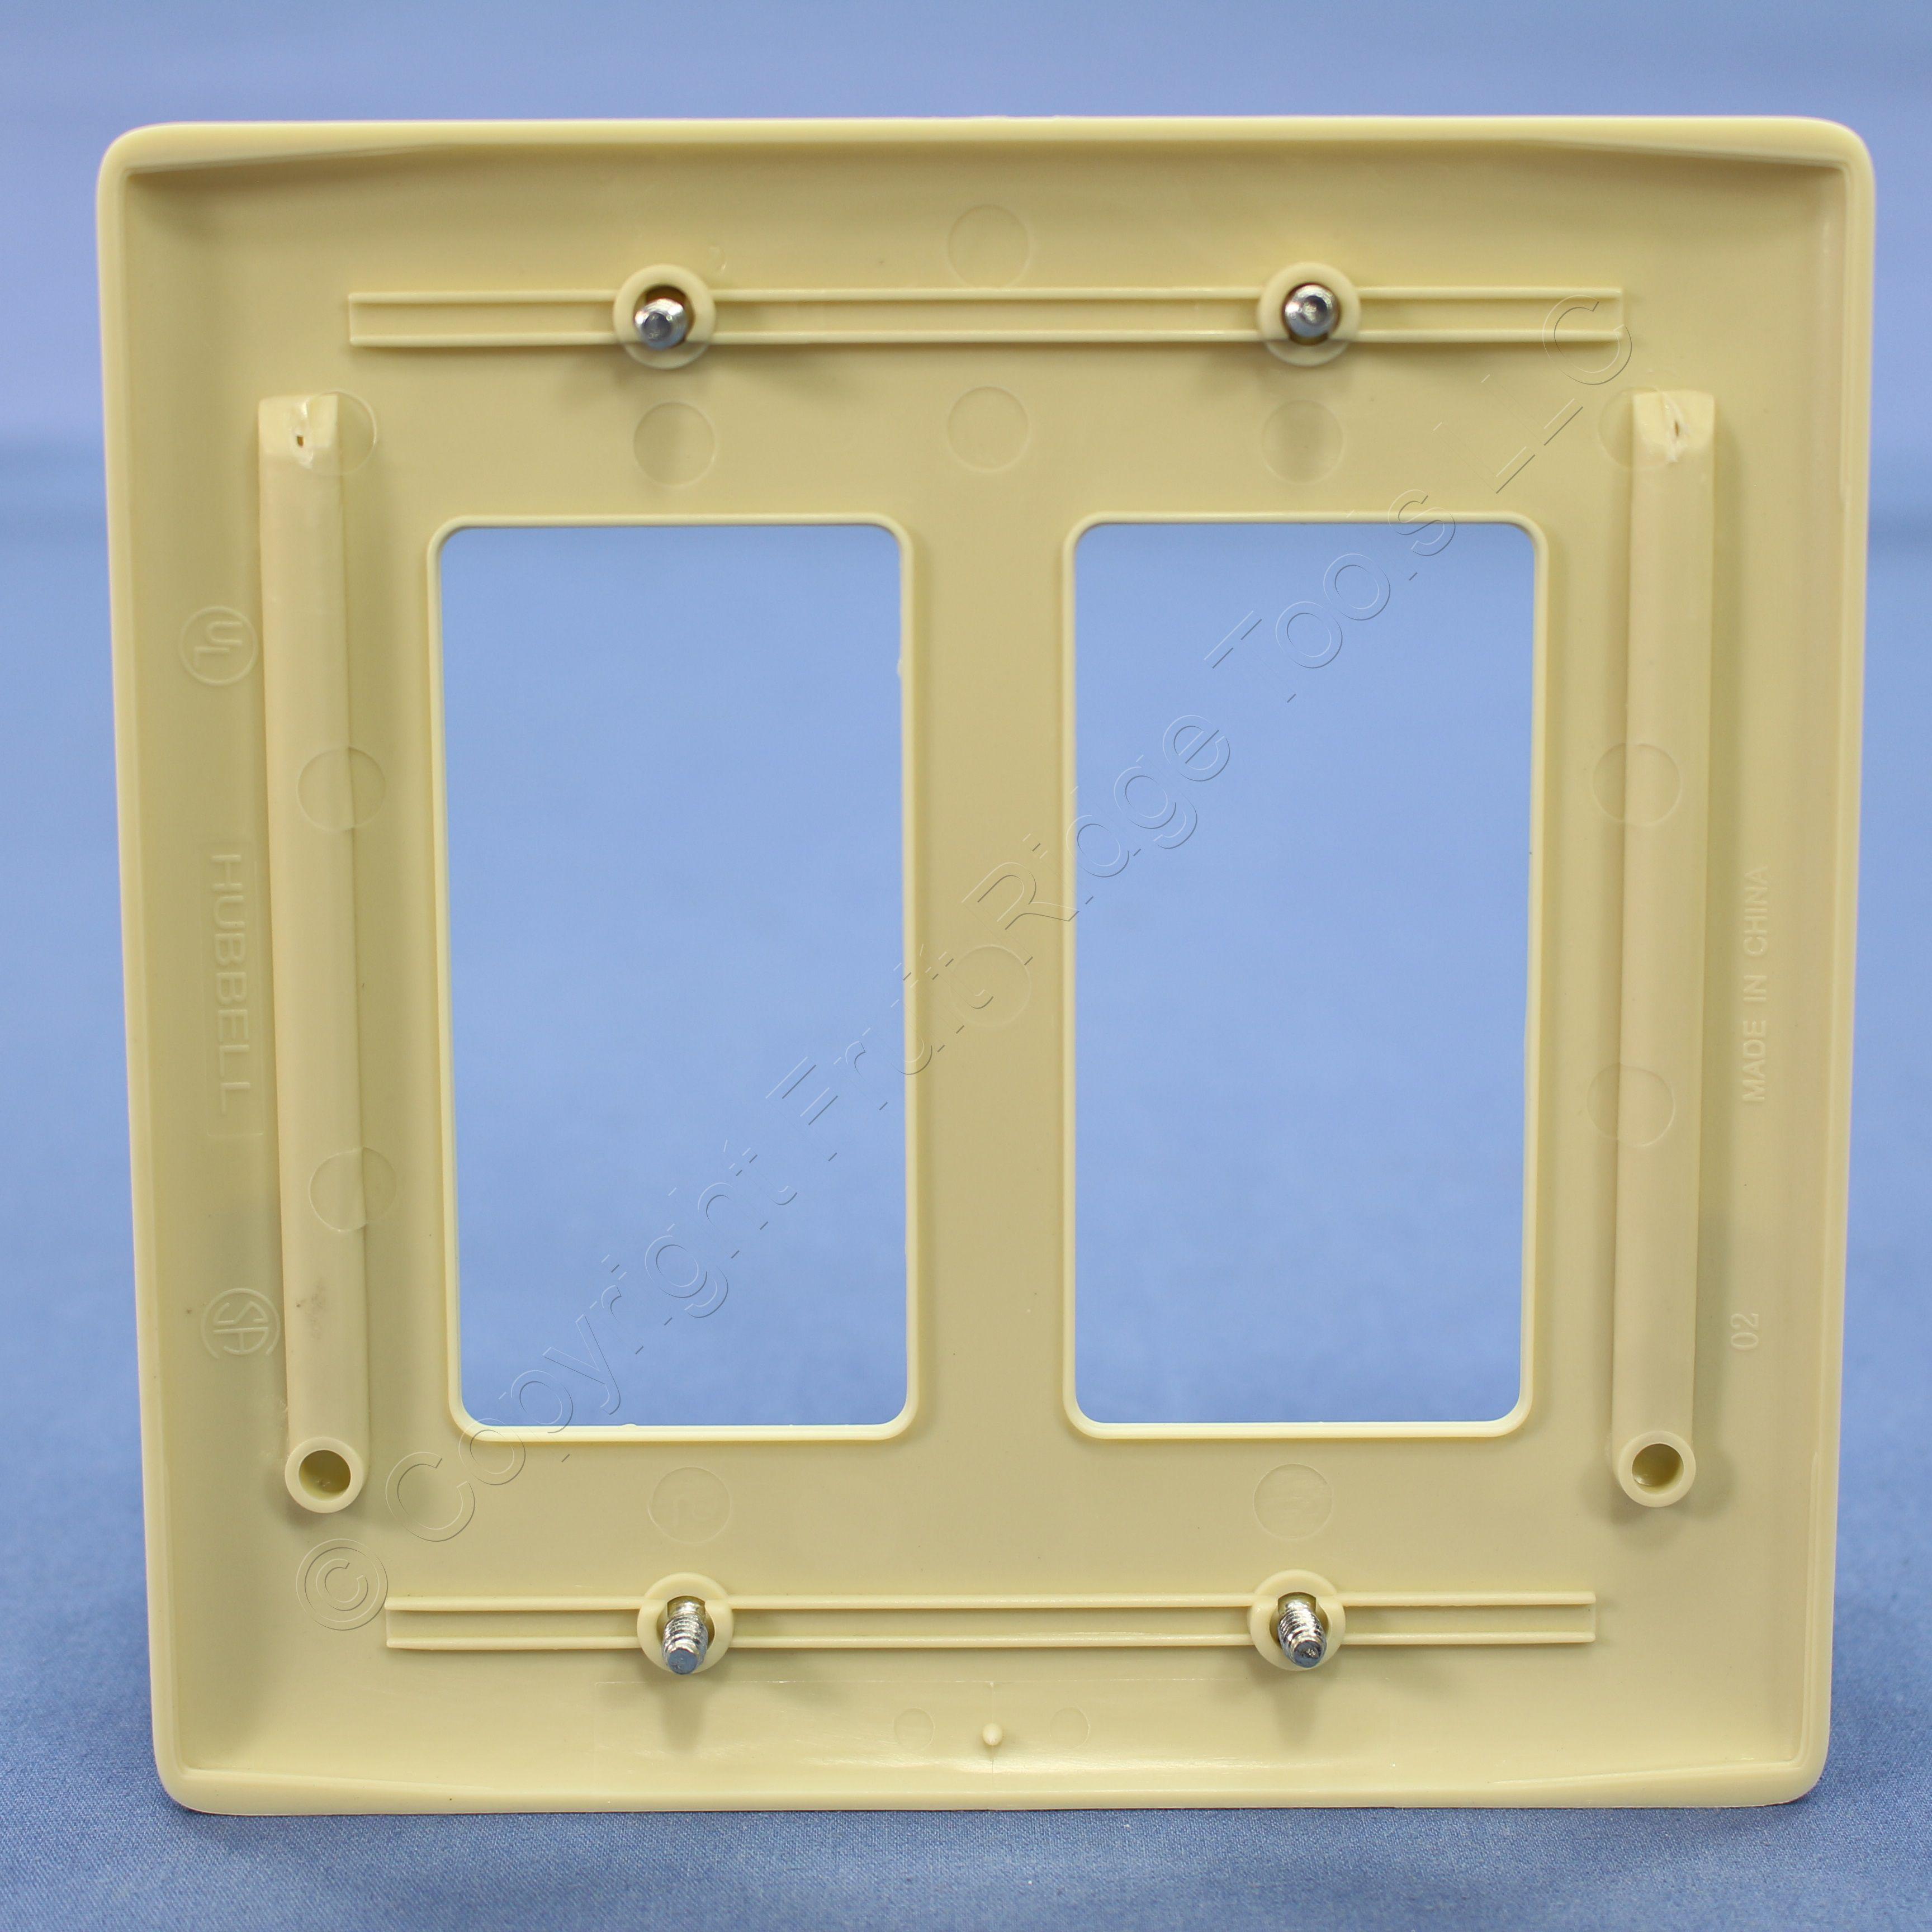 Outstanding Taymac Decorator Wall Plate Mold - Art & Wall Decor ...